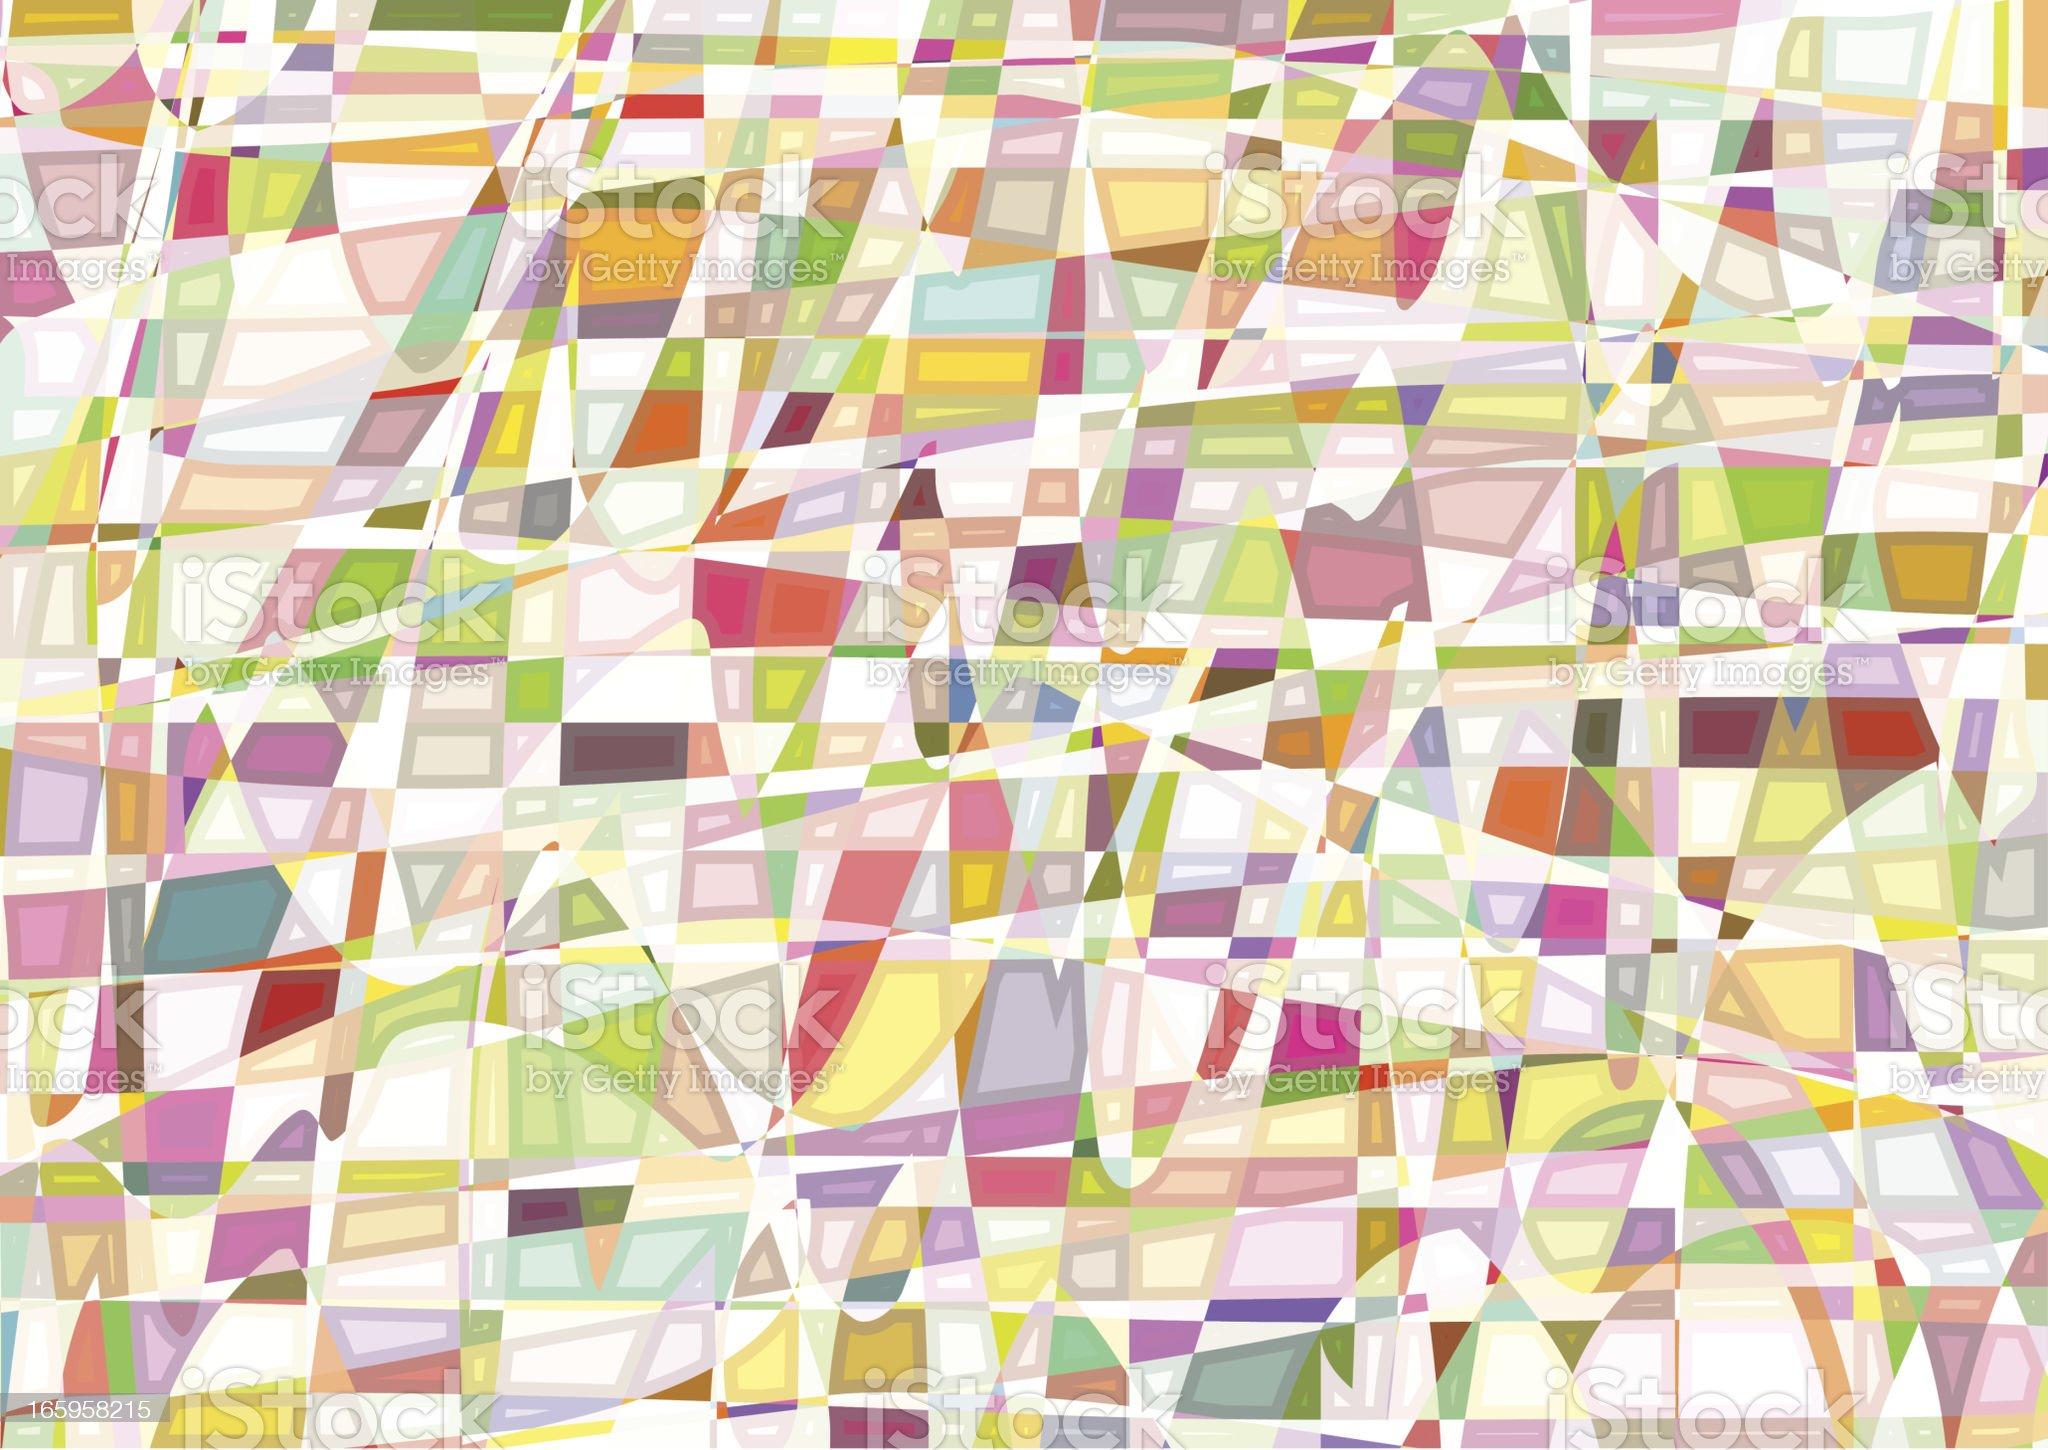 Mosaic retro background. royalty-free stock vector art